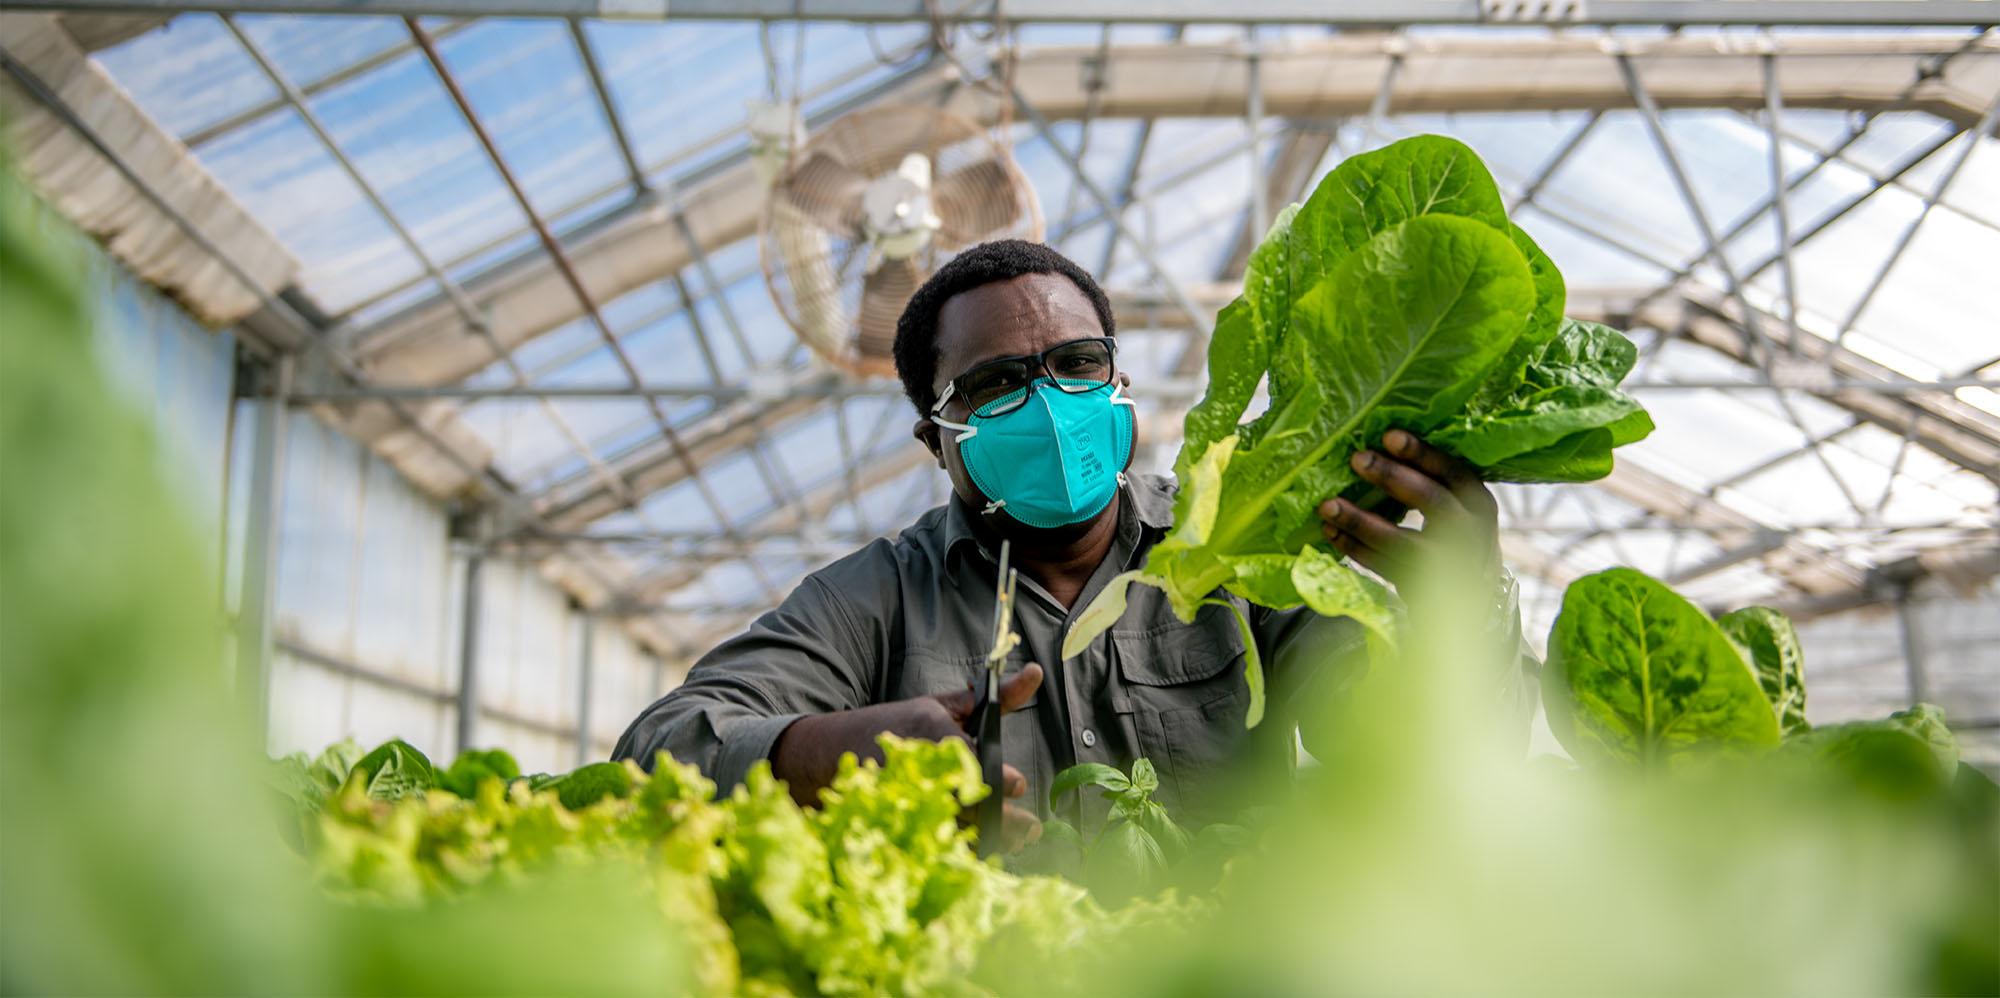 M21063- Greenhouse, Lettuce Harvesting-6951